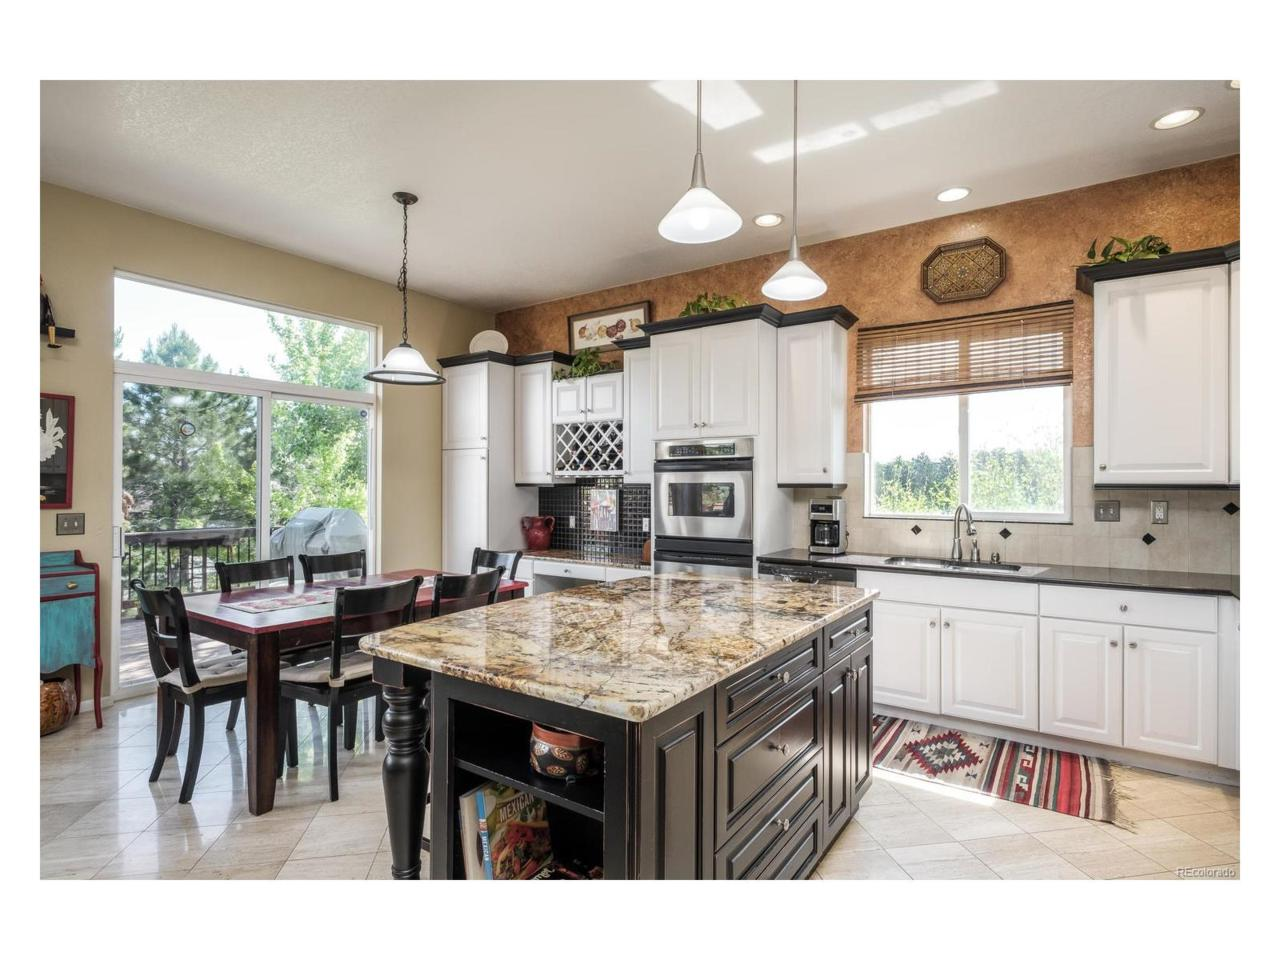 10155 Joseph Drive, Highlands Ranch, CO 80130 (MLS #2030250) :: 8z Real Estate